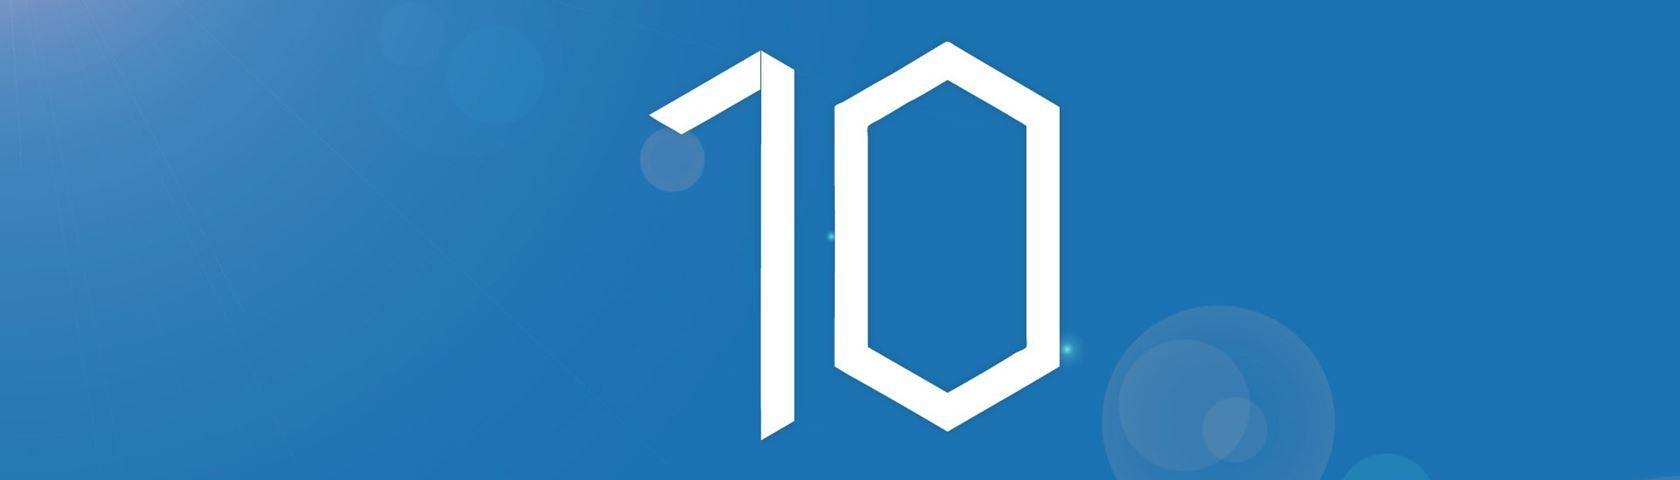 Windows 10 Squared 10